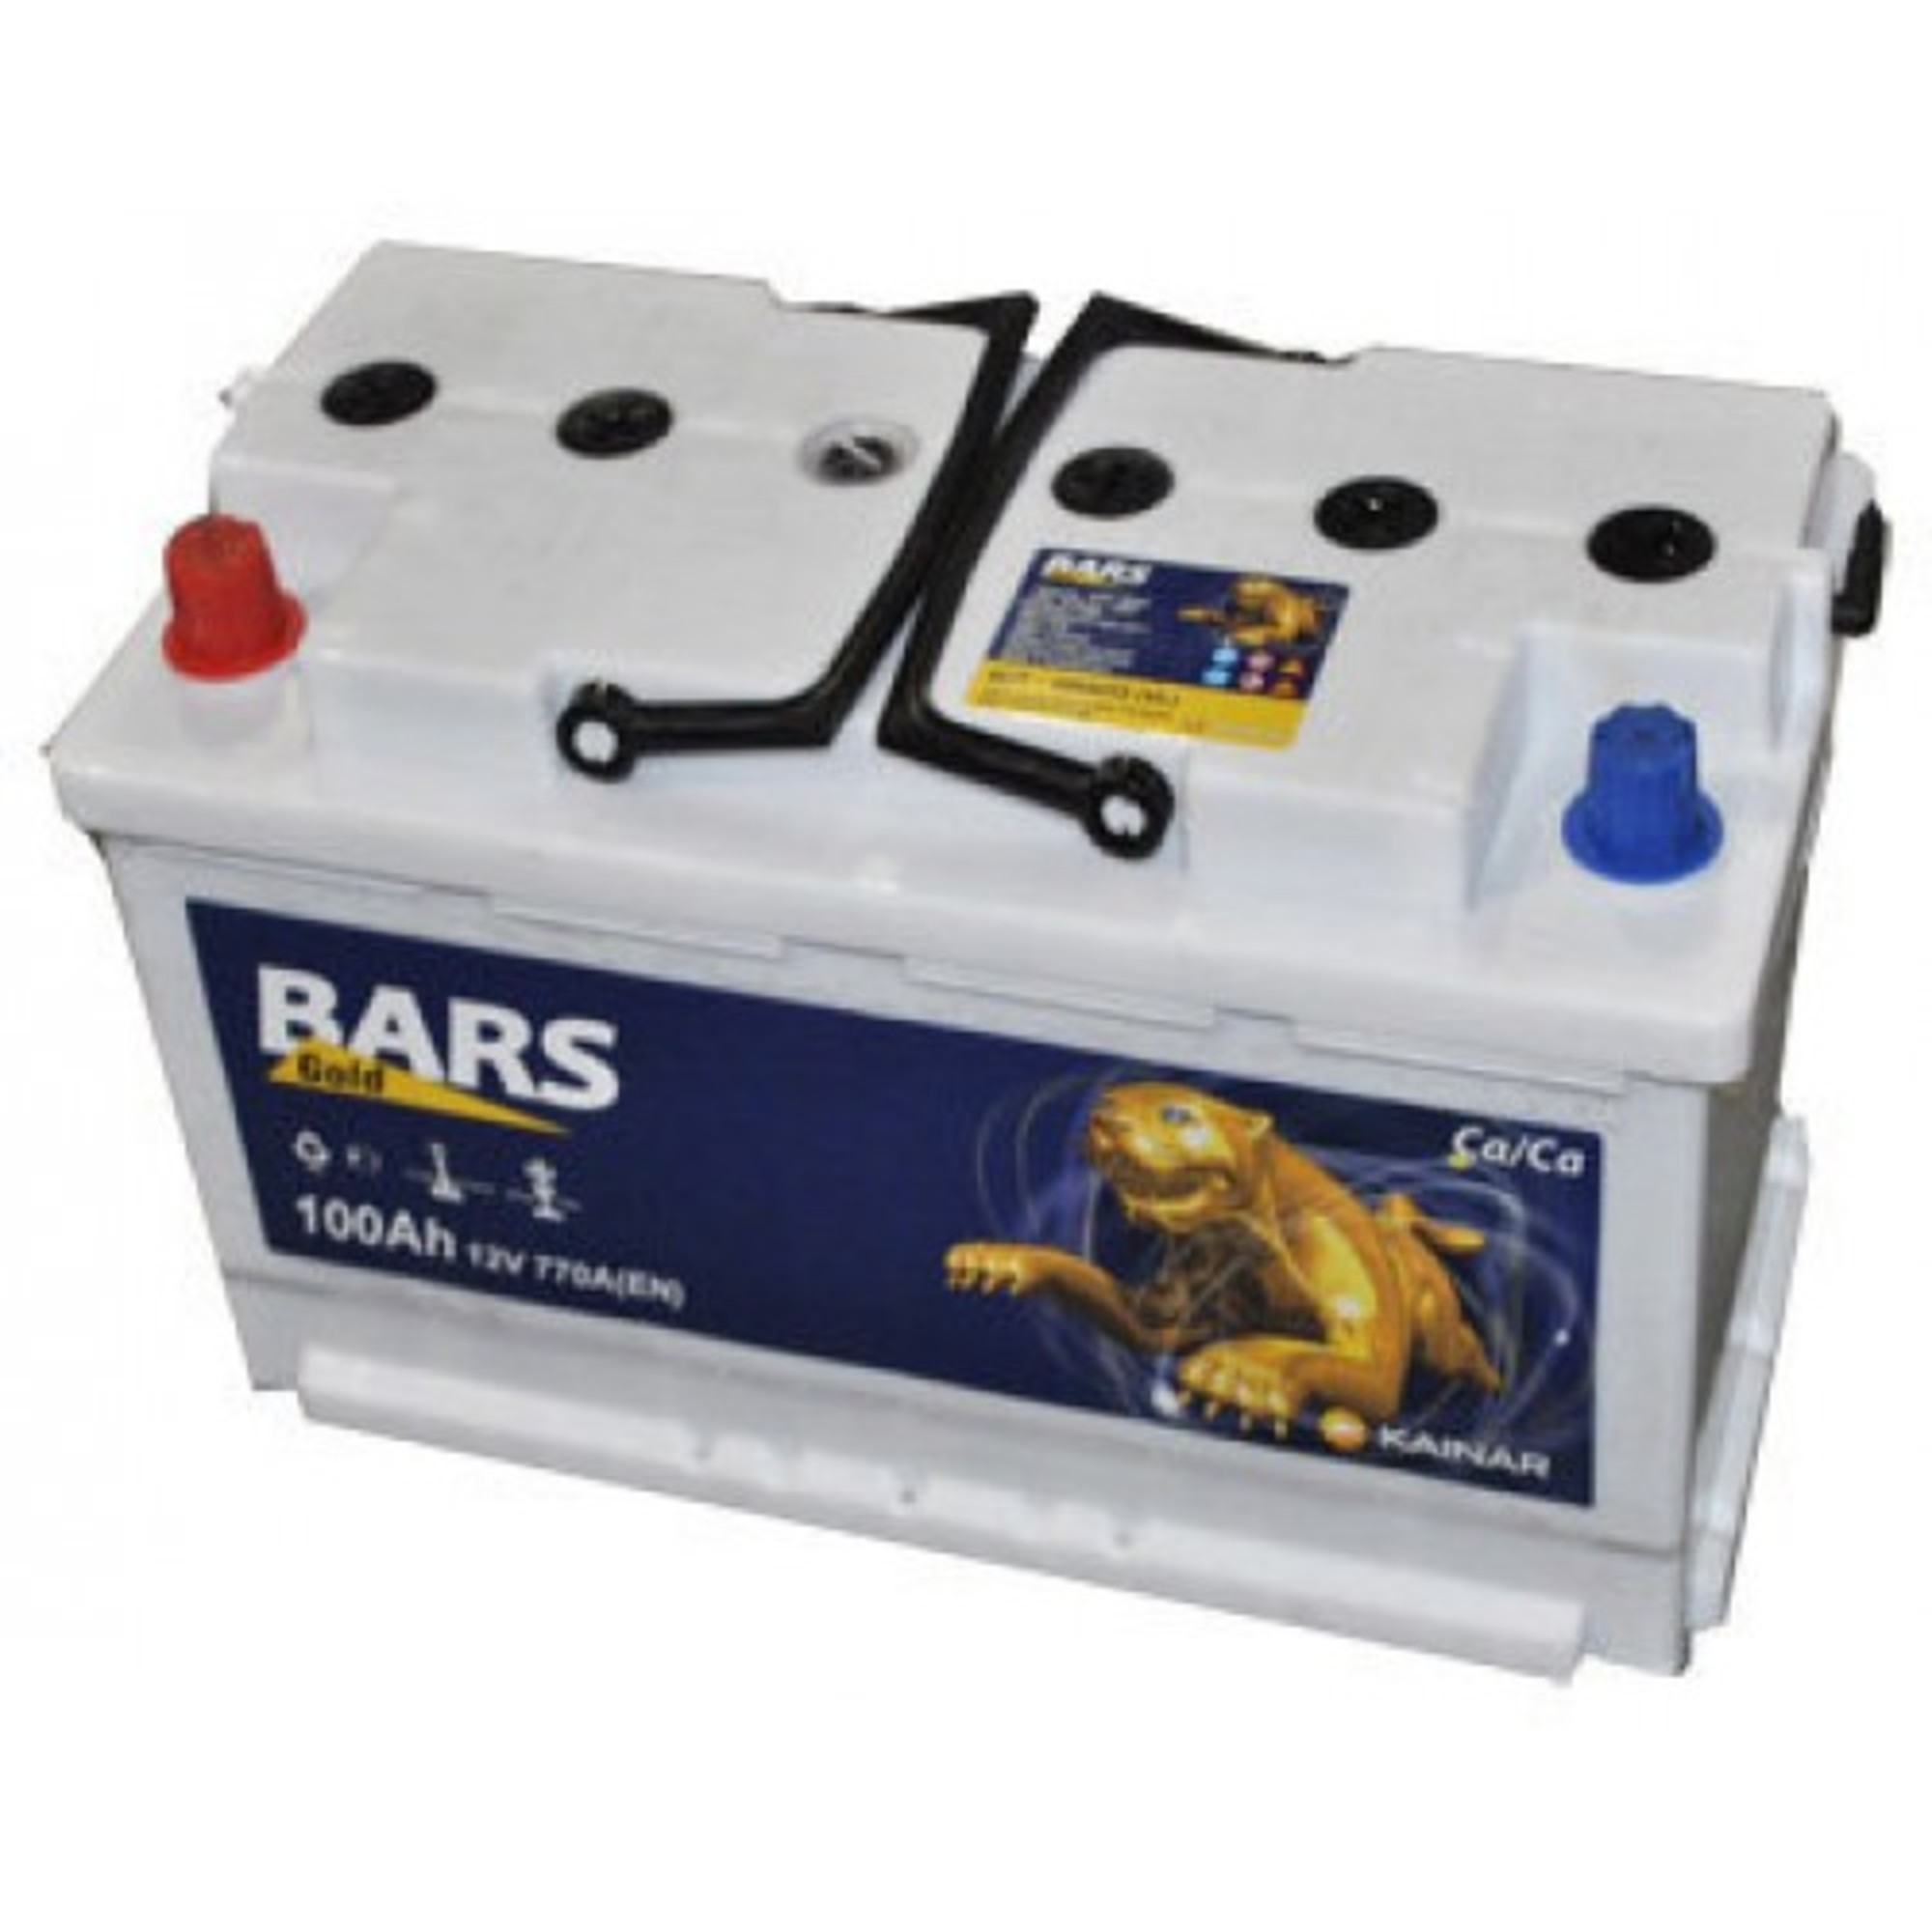 Аккумулятор 100 - 6 СТ BARS Gold п.п. (АПЗ)